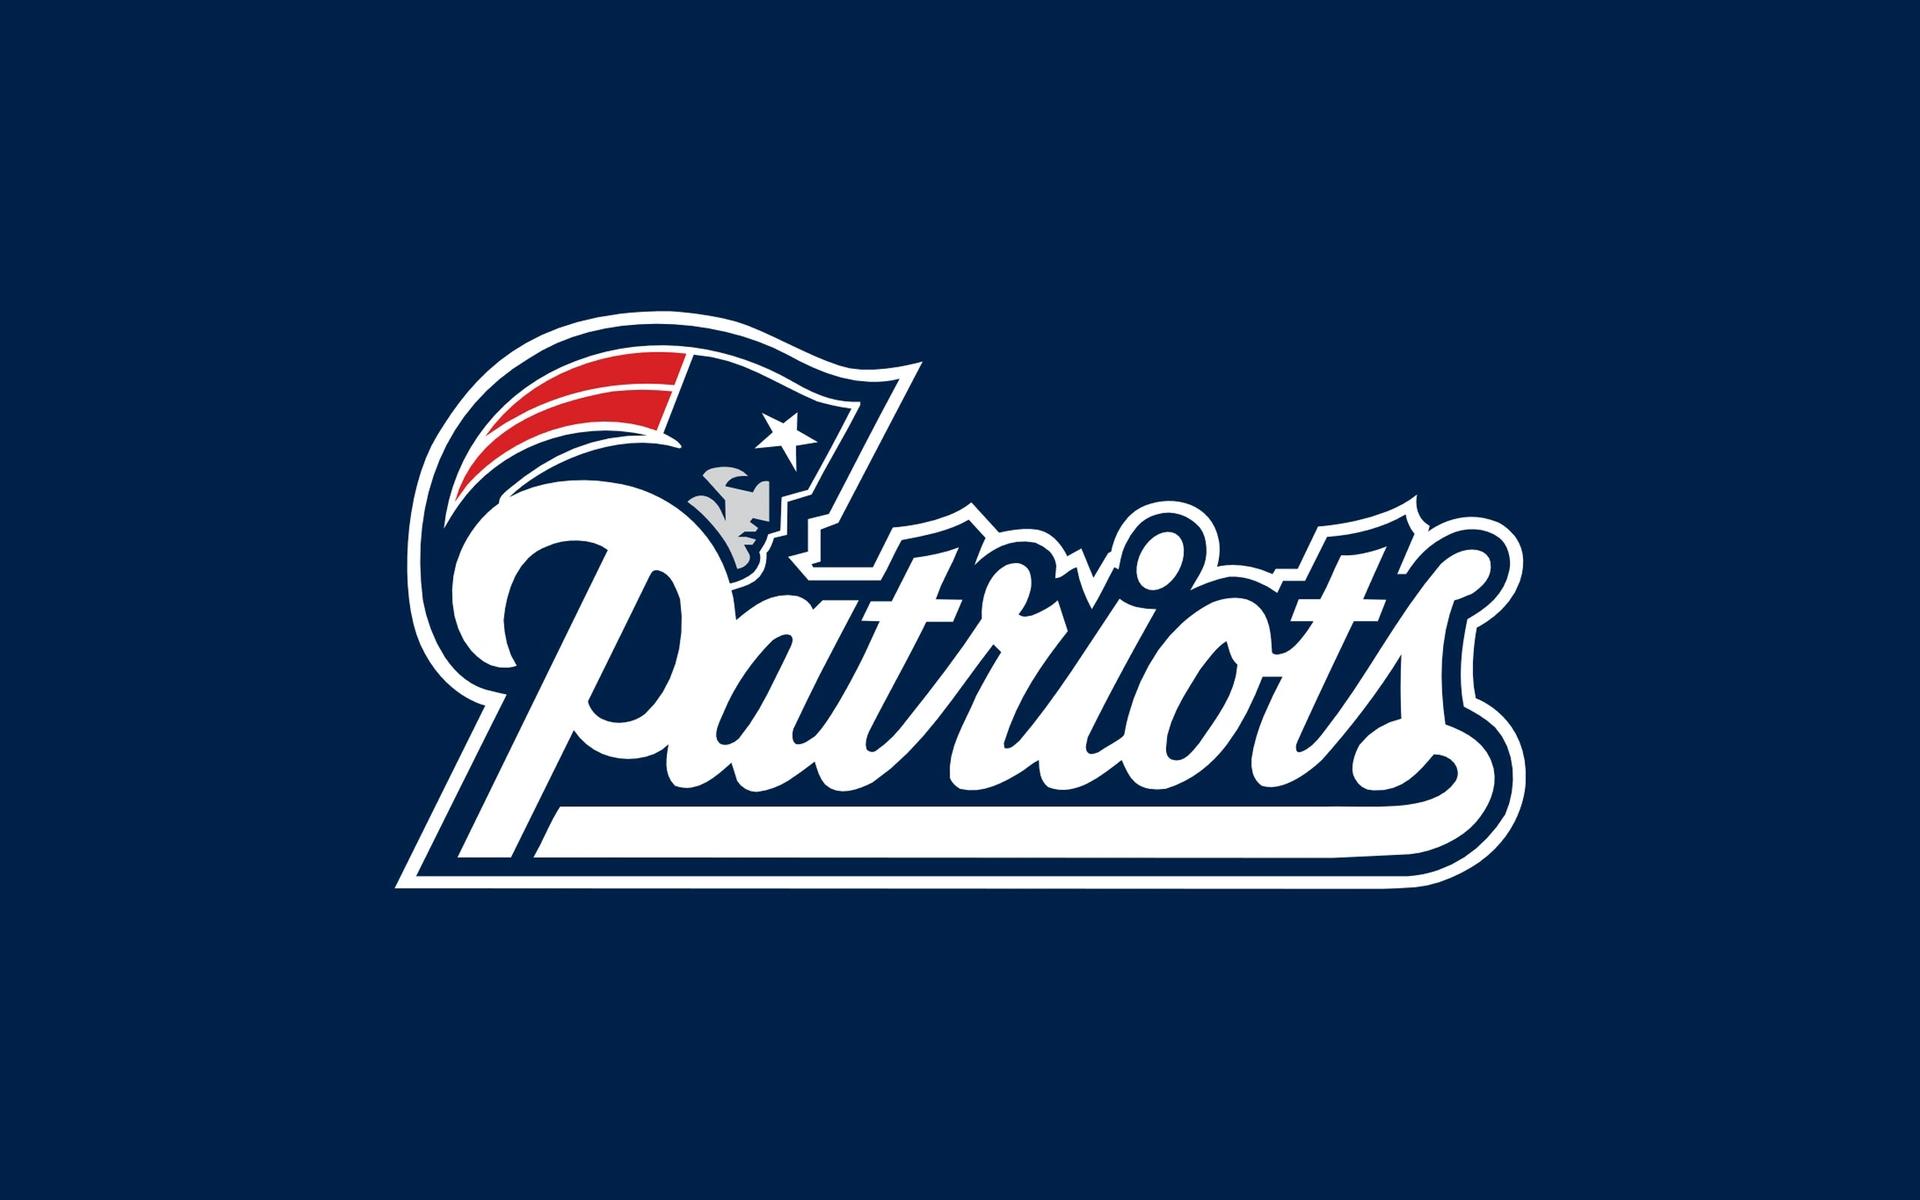 New England Patriots Logo Wallpaper HD 55966